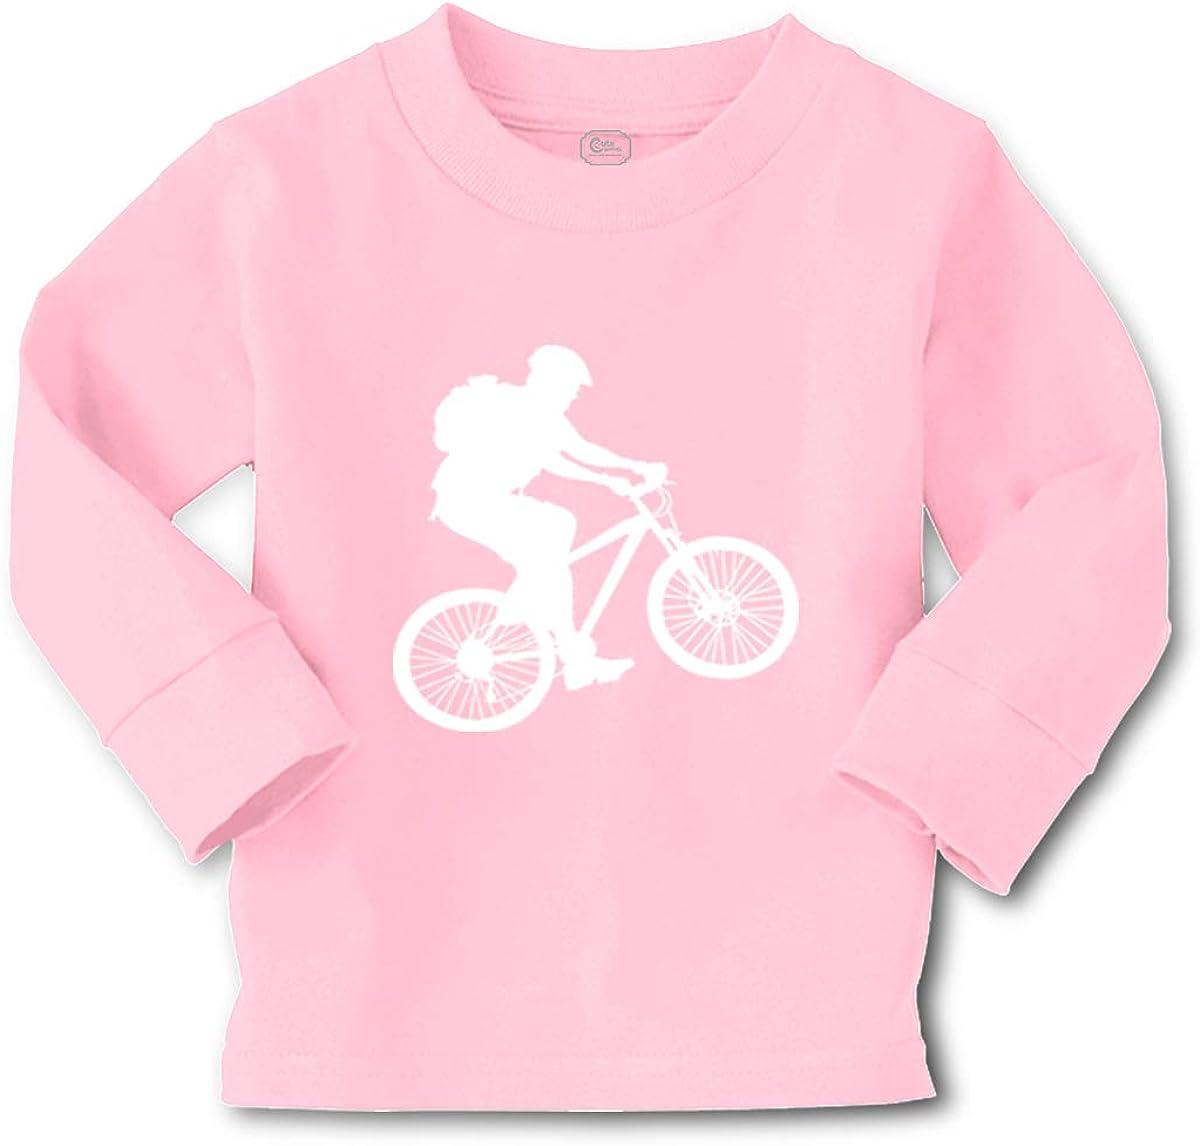 Cute Rascals Kids Long Sleeve T Shirt BMX Sport Cotton Boy & Girl Clothes Funny Graphic Tee